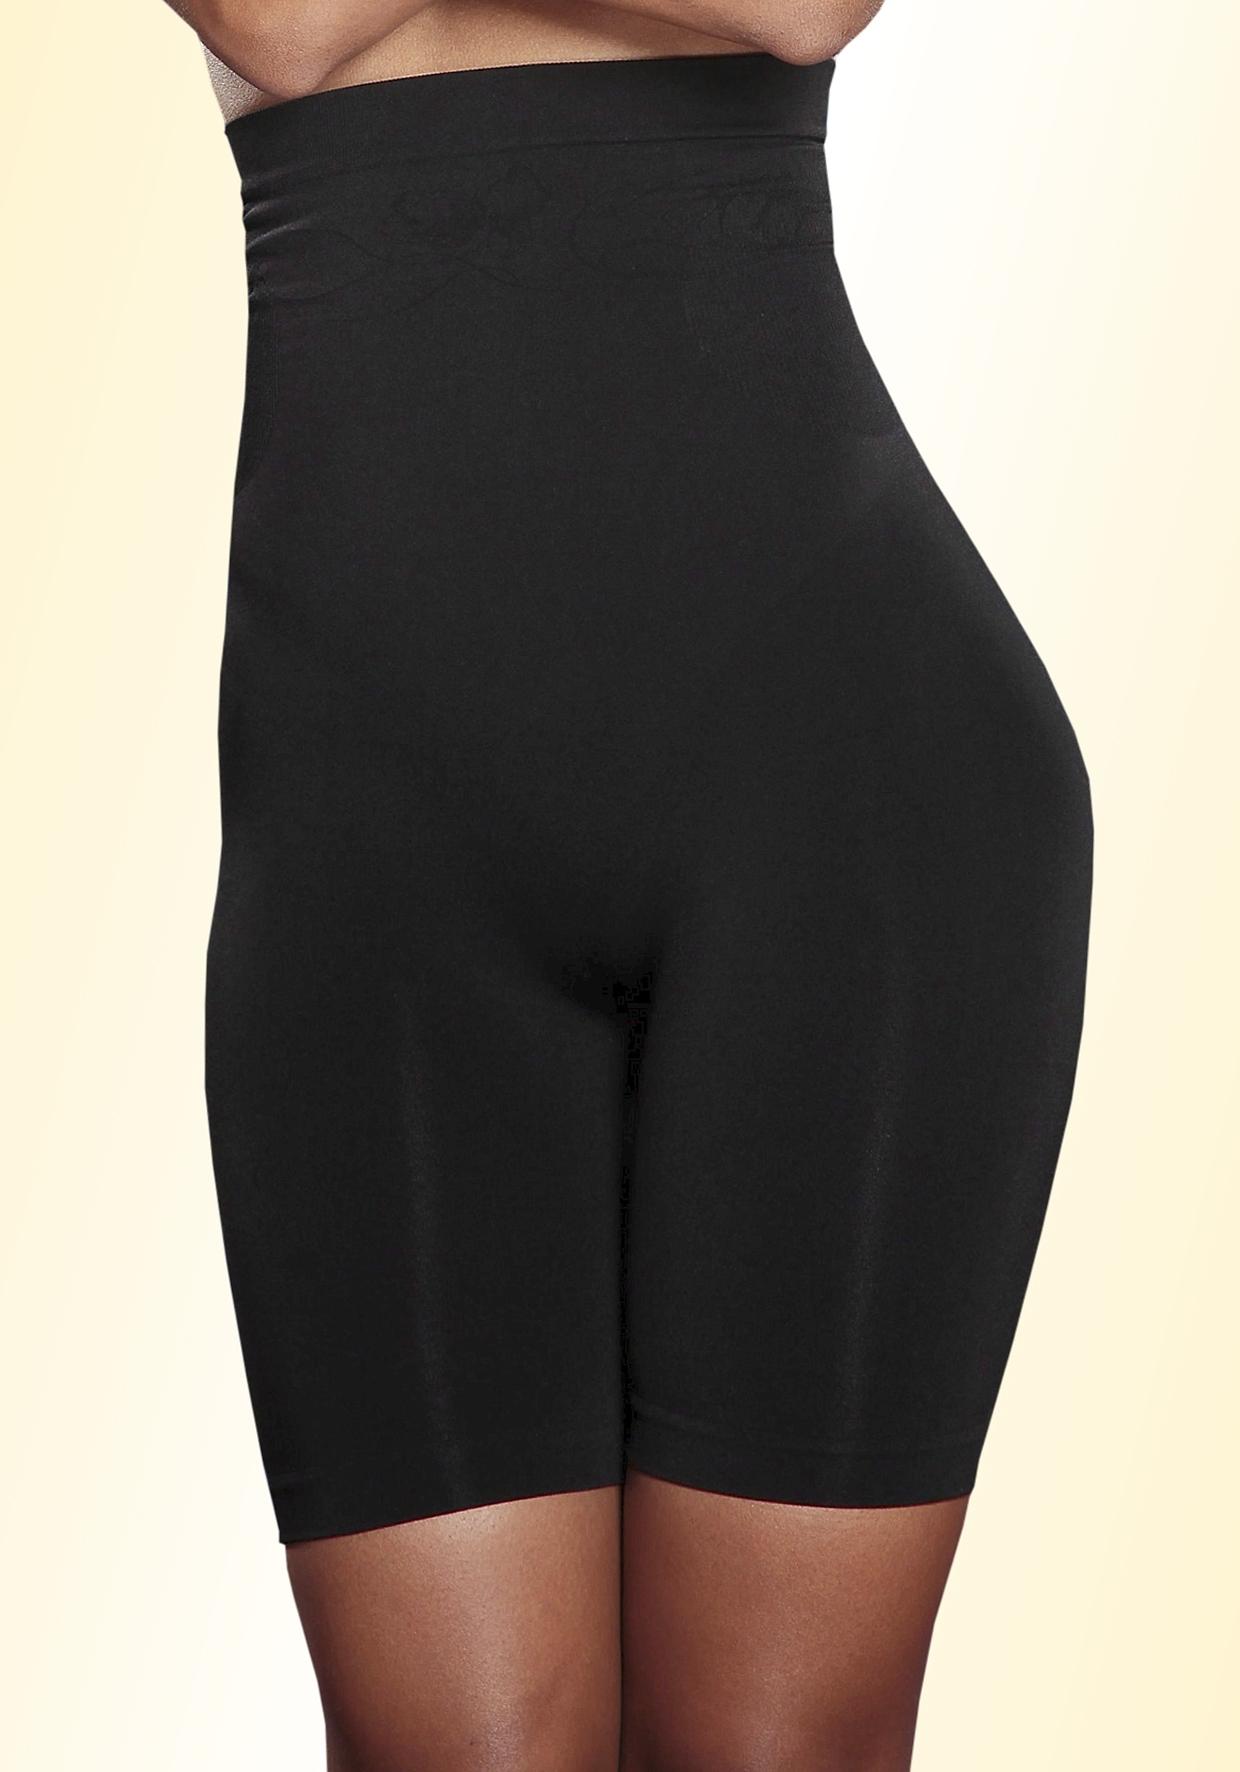 Lascana bodyforming-broekje met hoge taille goedkoop op lascana.nl kopen